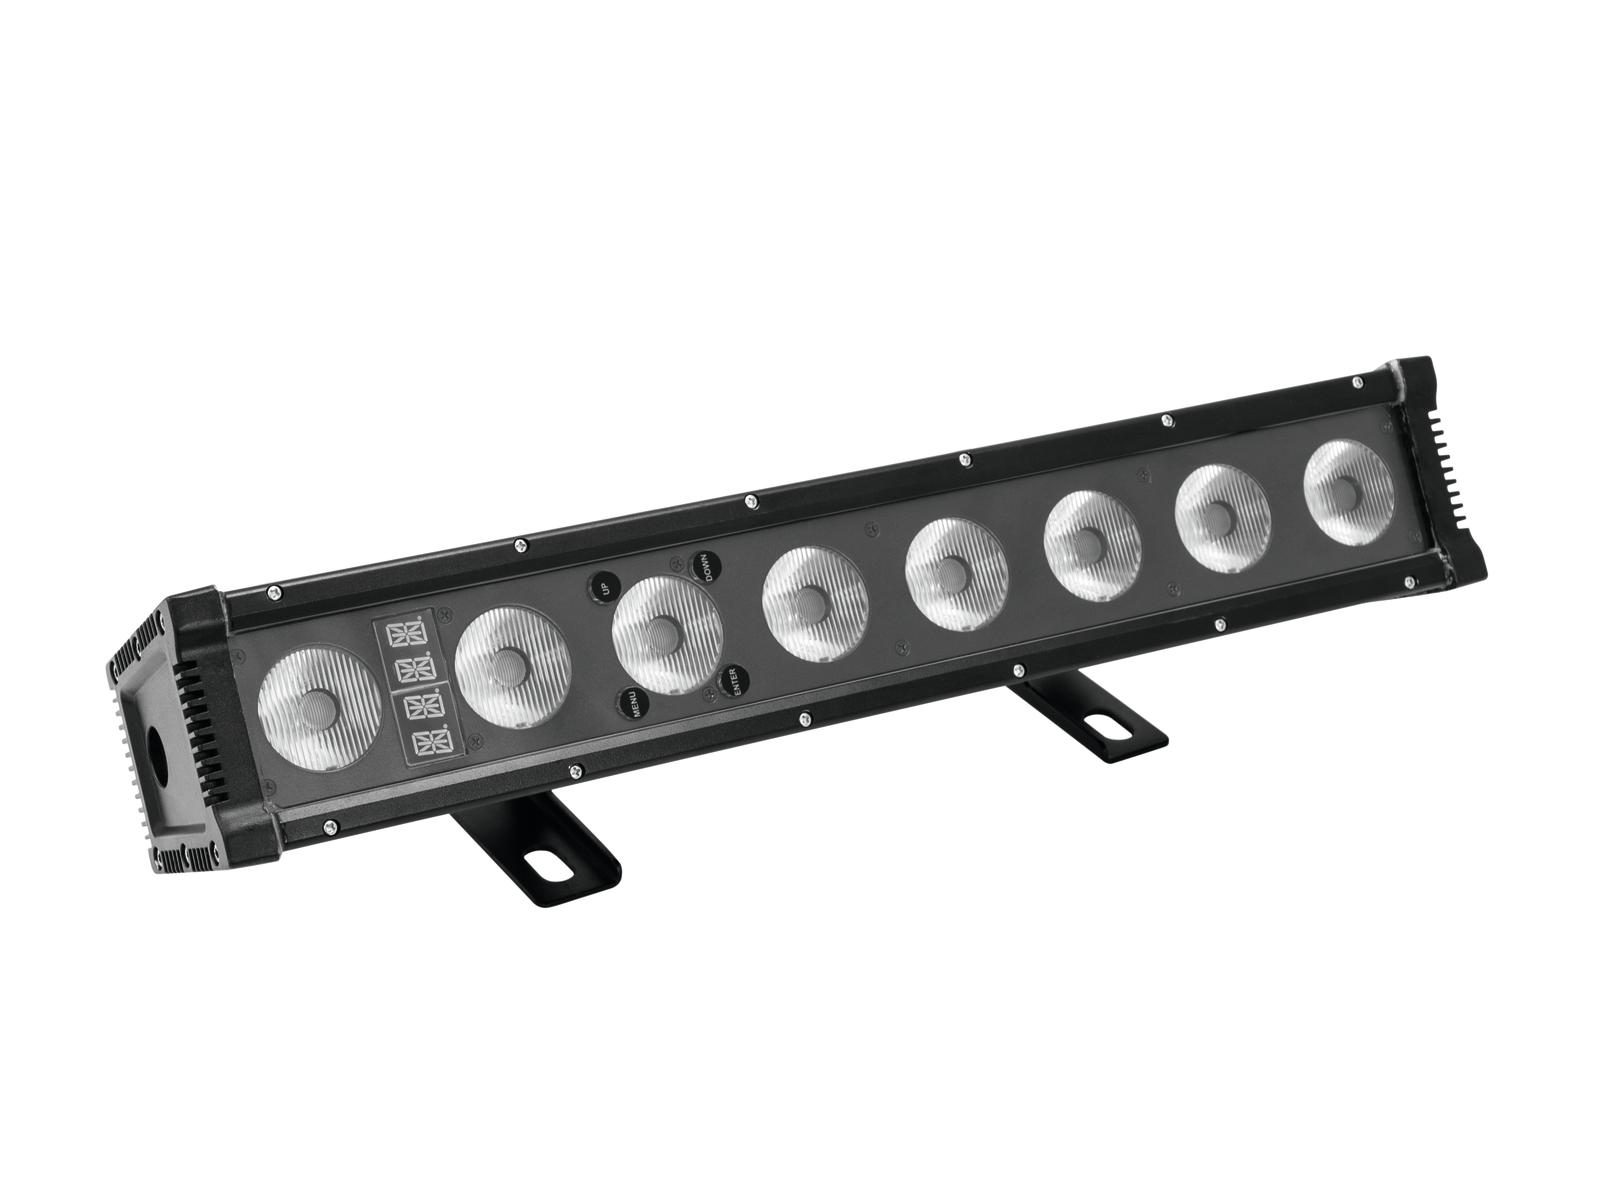 Eurolite LED IP T1000, 8x10W QCL, IP65, DMX, světelná lišta